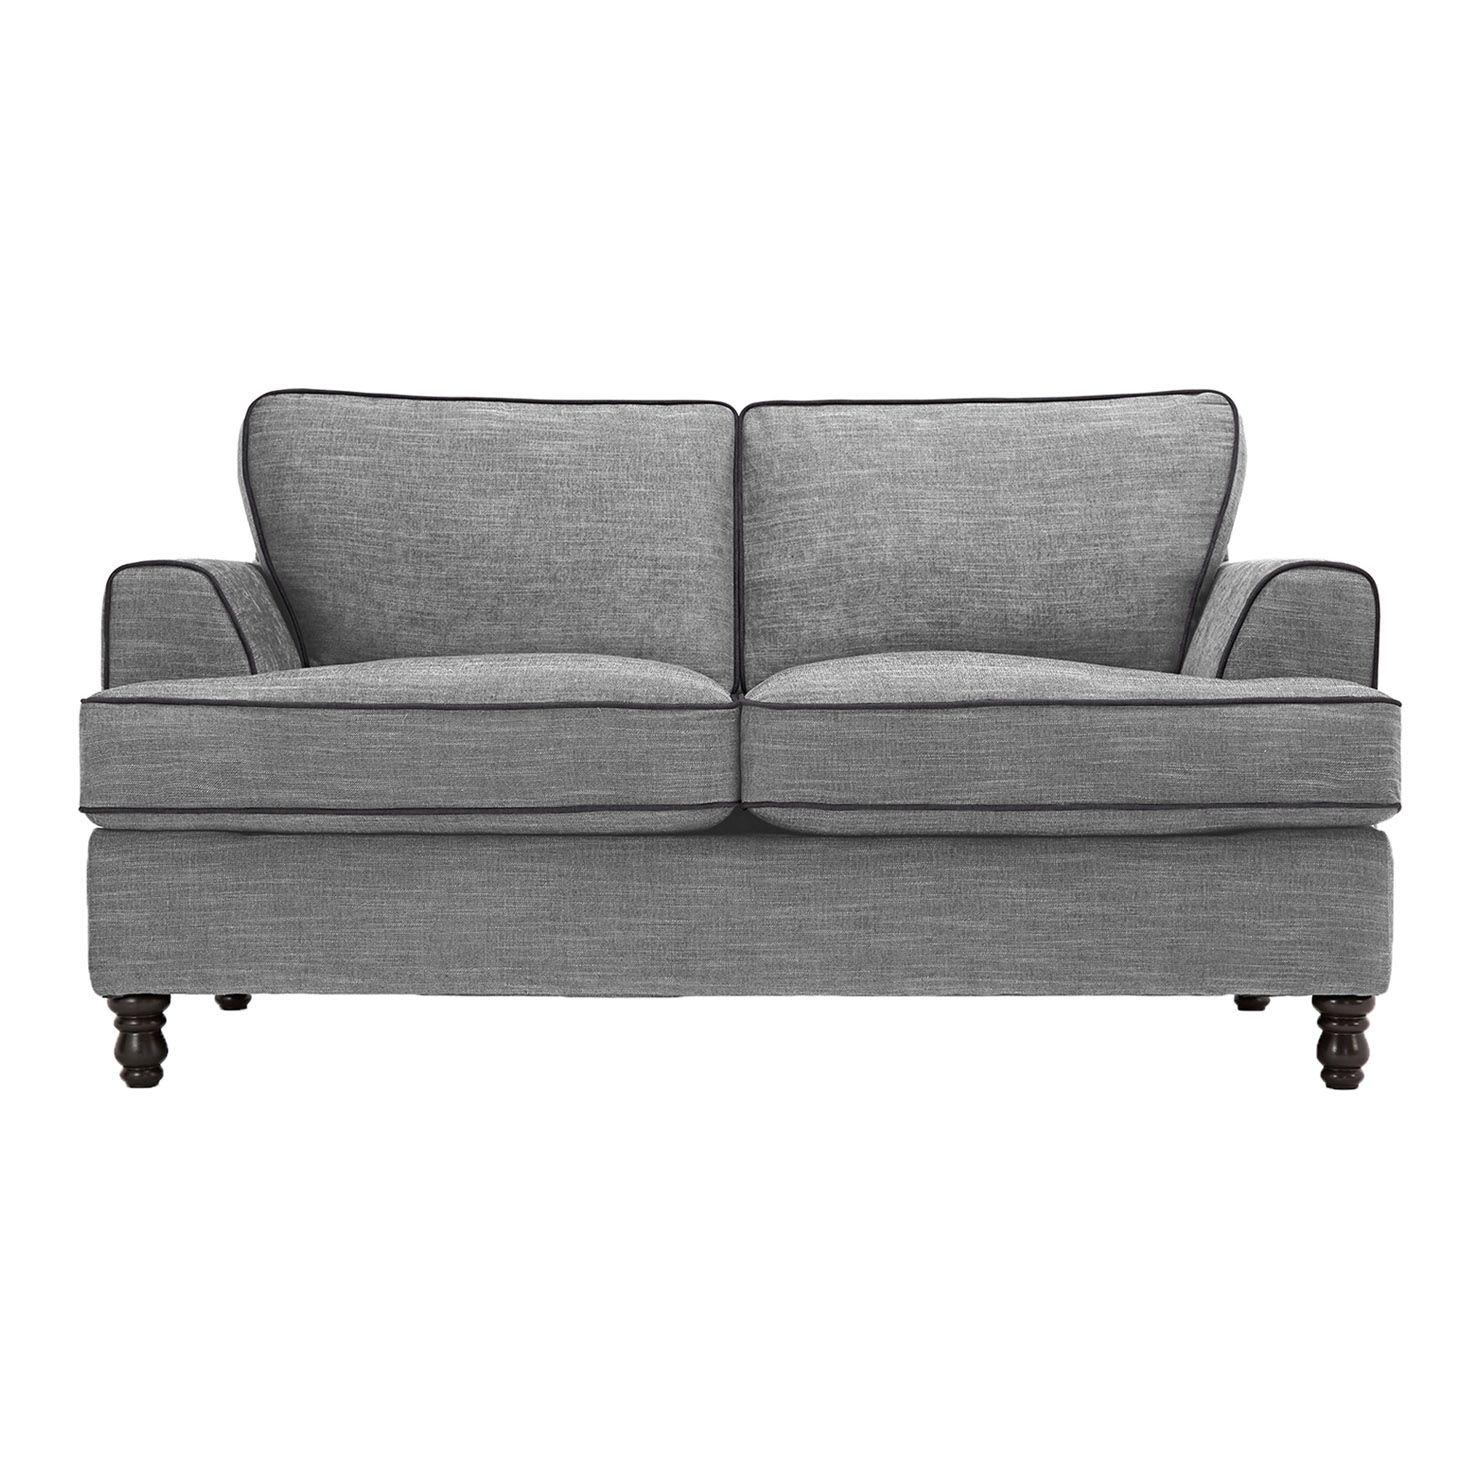 Bonnie 2 Seater Sofa Bed Light Grey Dark Grey Piping Sofa 2 Seater Sofa Home